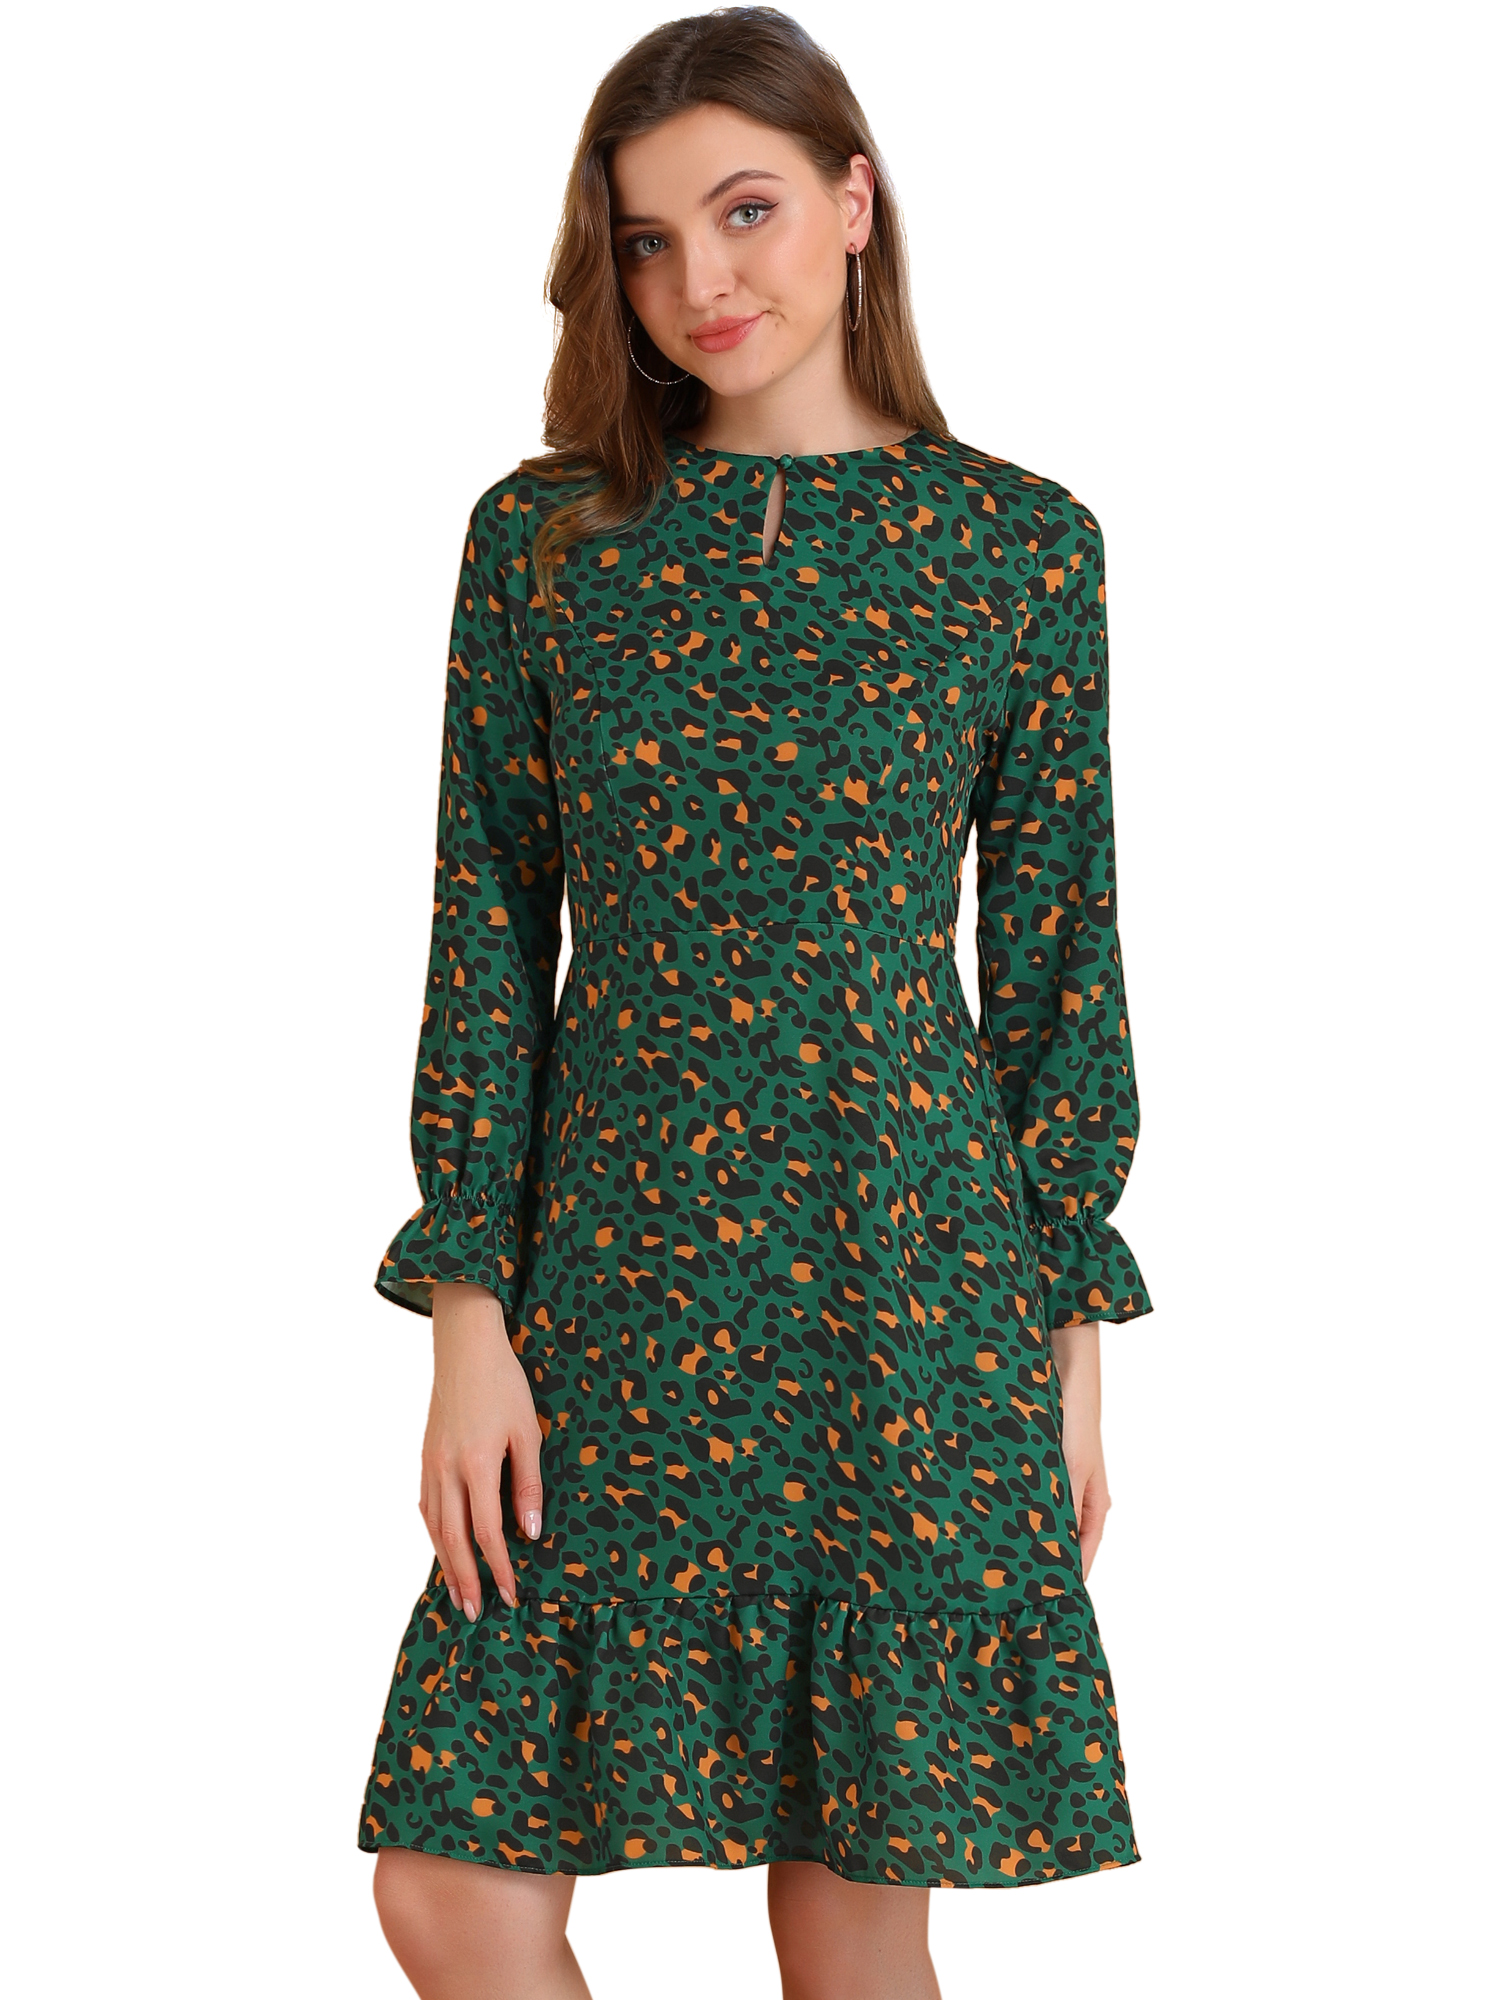 Women's Leopard Print Long Sleeve Keyhole Ruffle Hem Dress Green L (US 14)